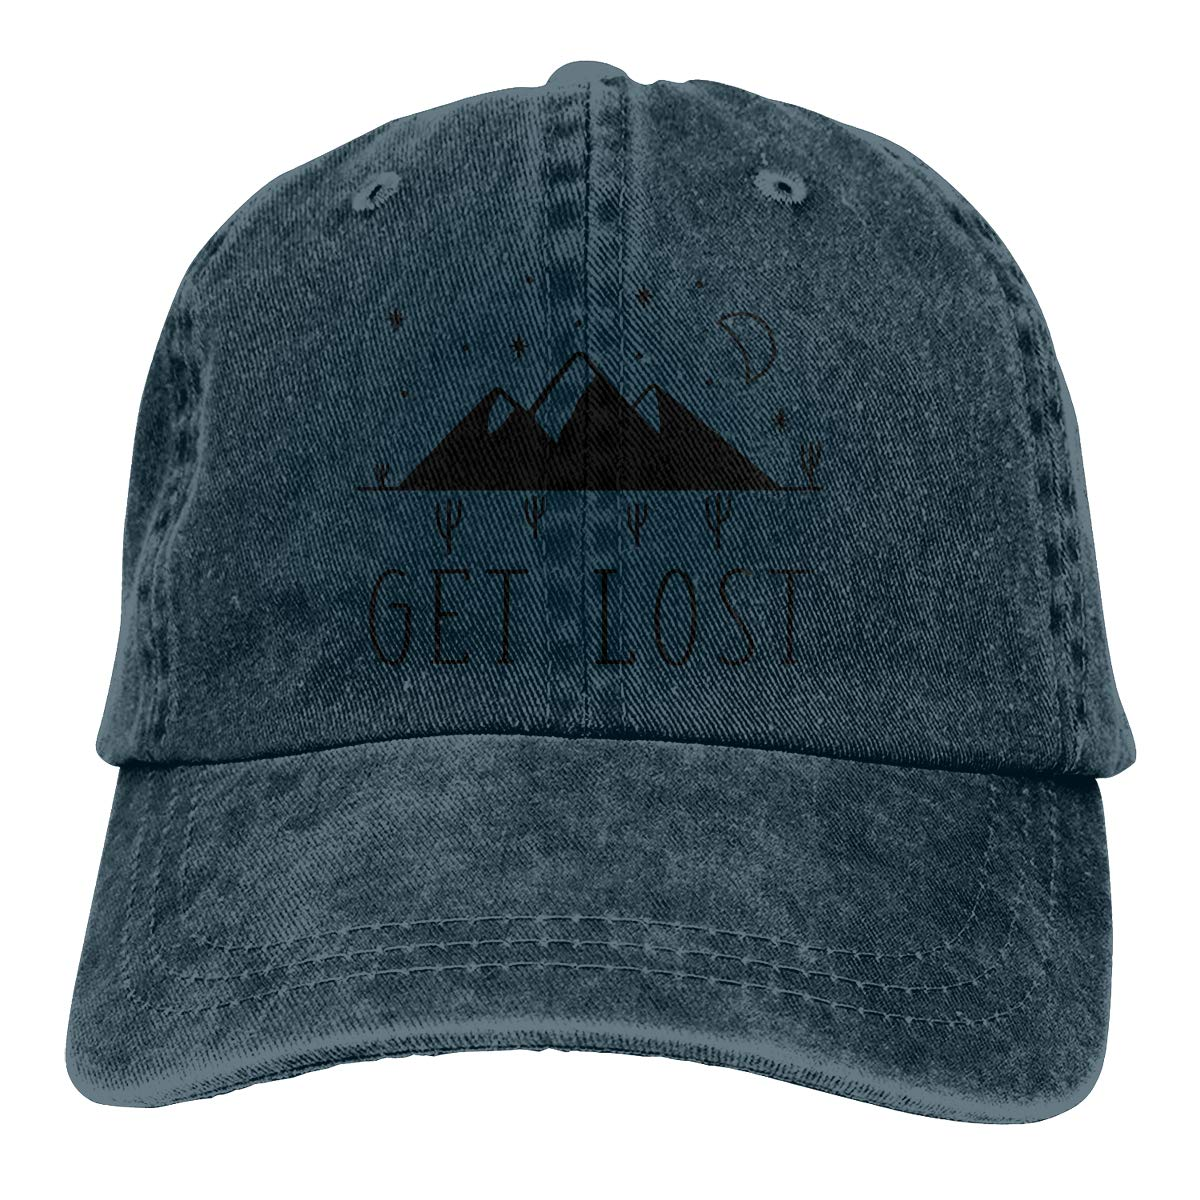 44eabd132310c Get Lost - Mountains Denim Hats Adjustable Baseball Cap Dad Hats at Amazon  Men s Clothing store